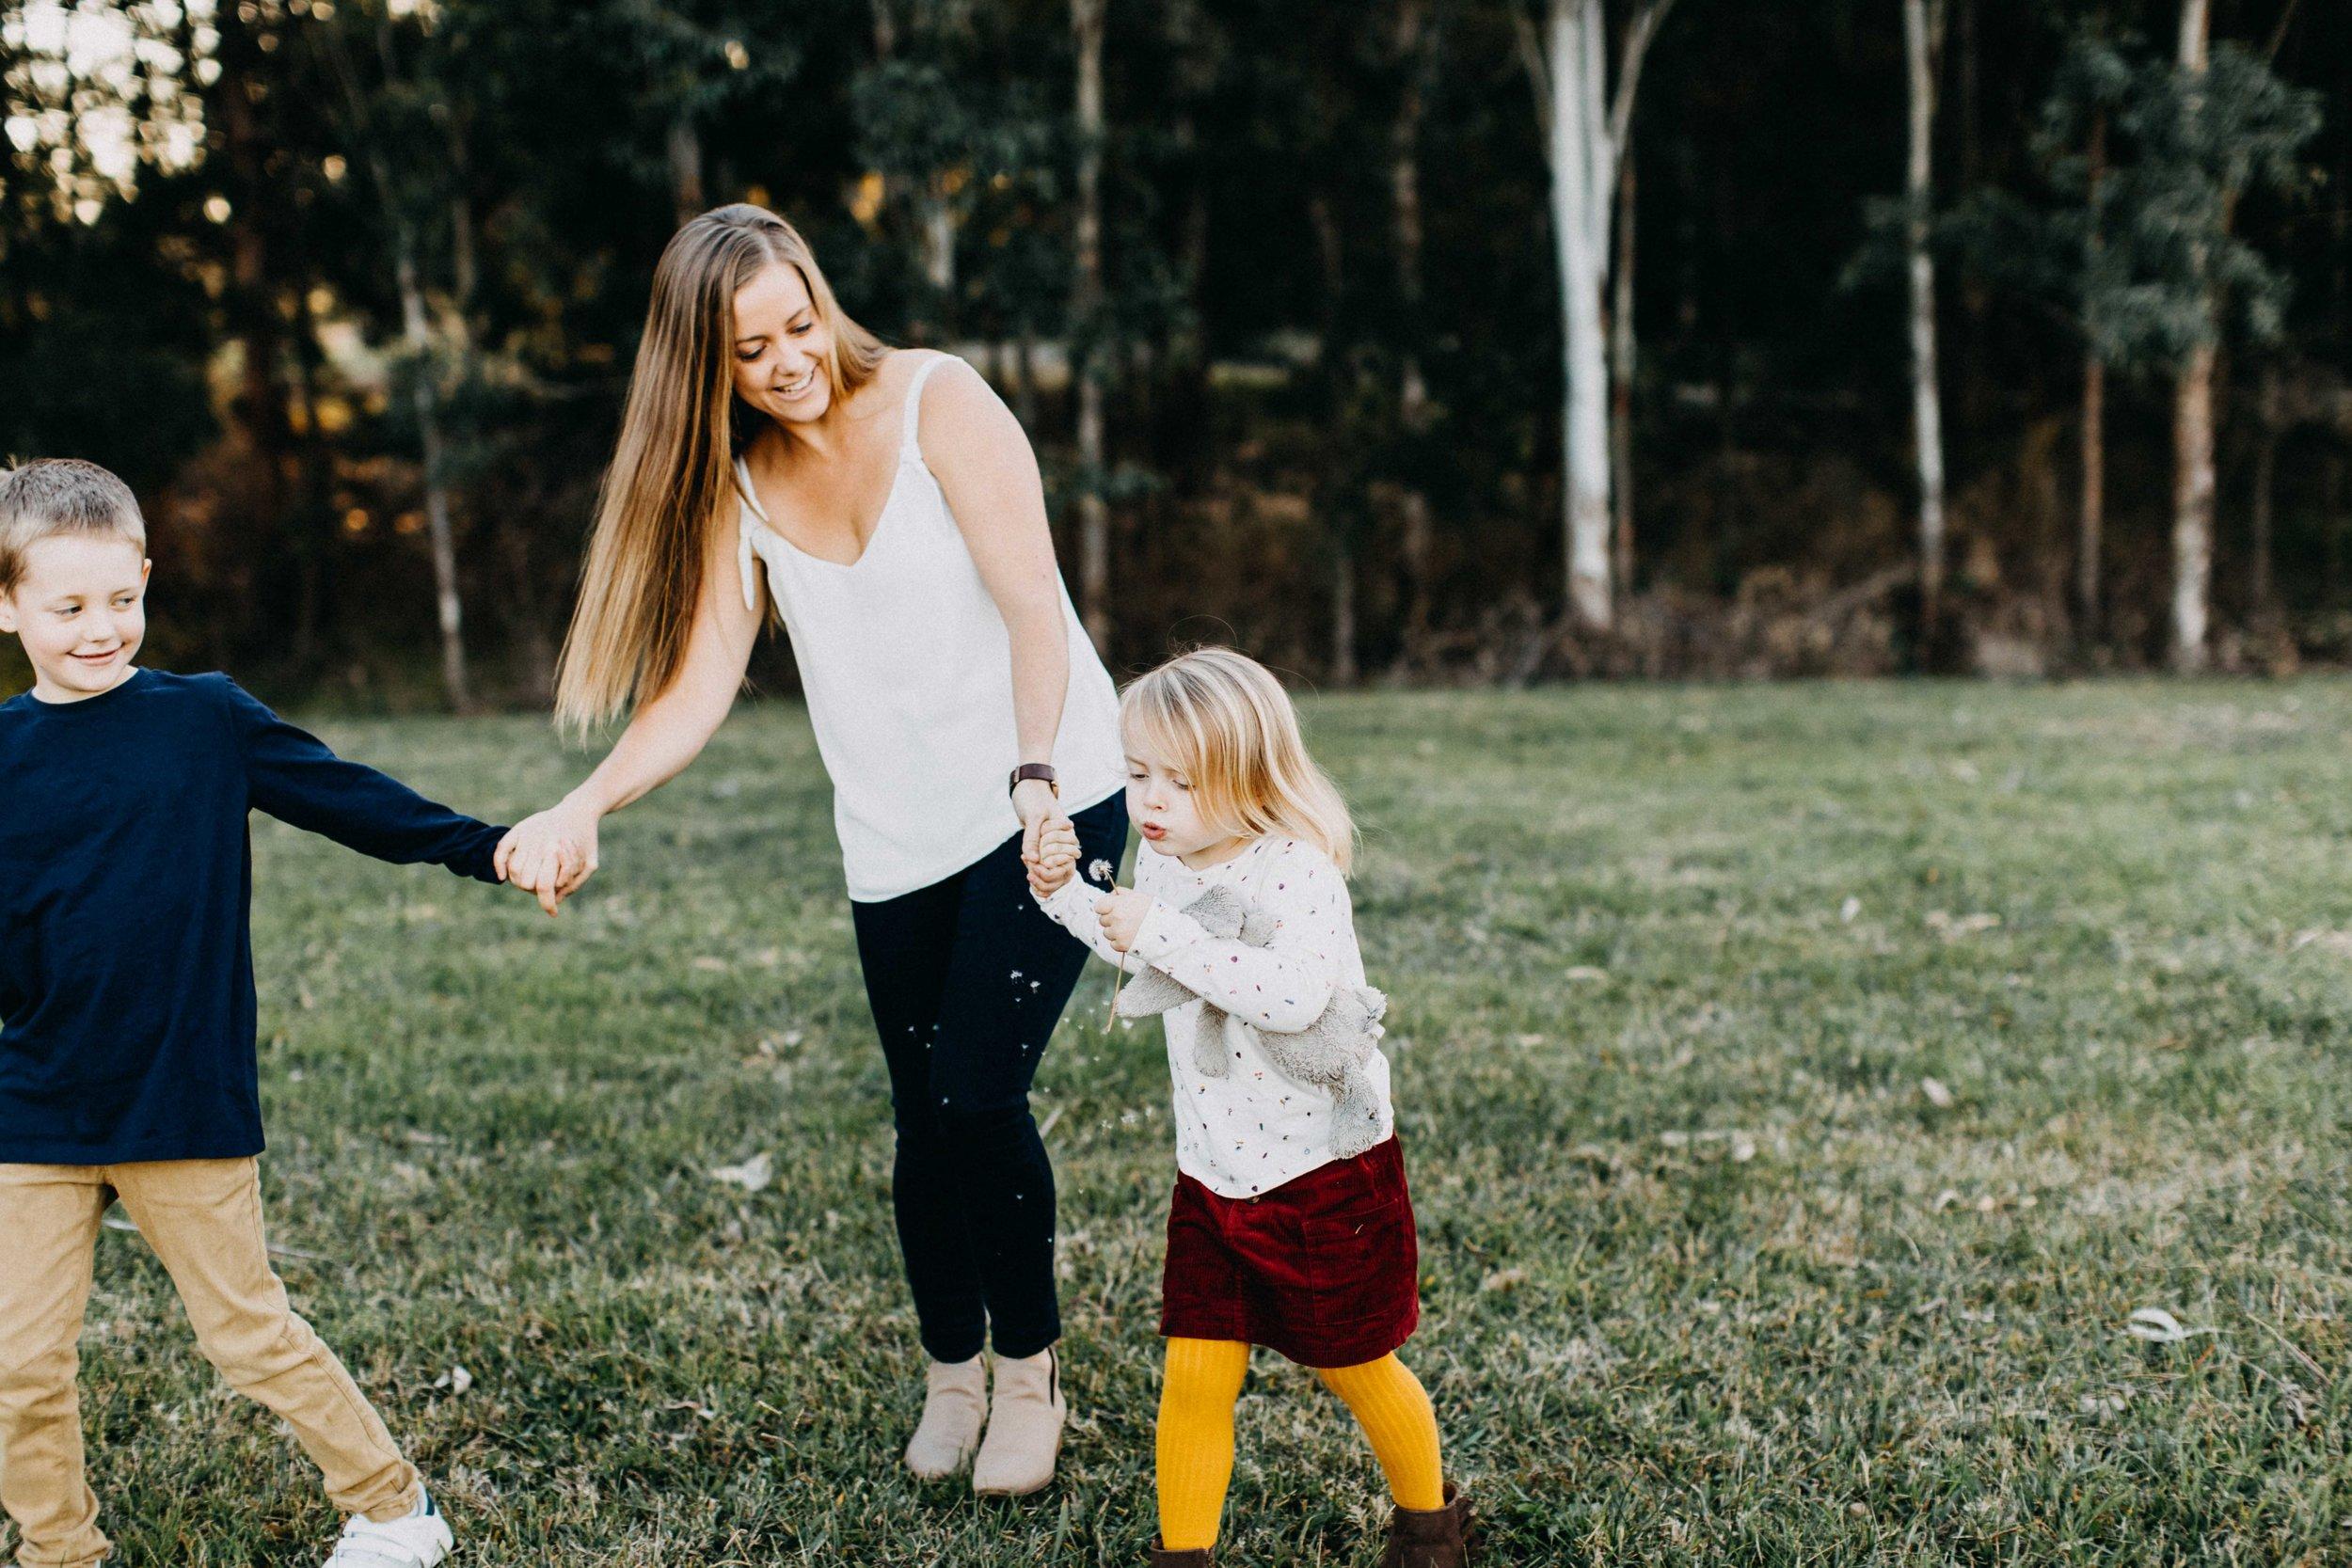 camden-family-photography-boot-family-session-27.jpg